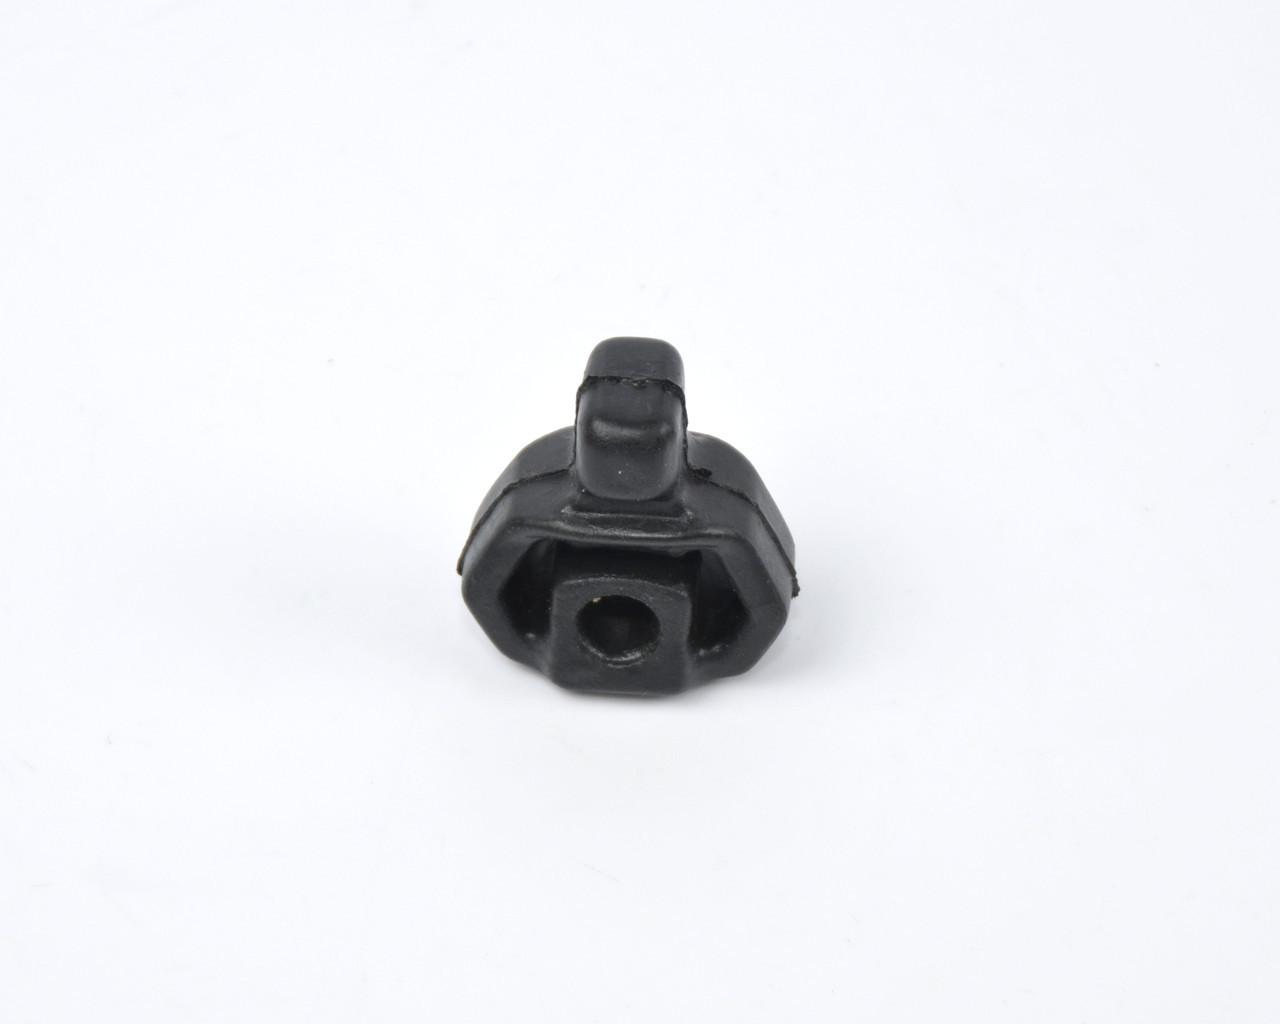 Резинка крепления глушителя на Renault Master II 1998->2010 - Febi (Германия) - FE10302